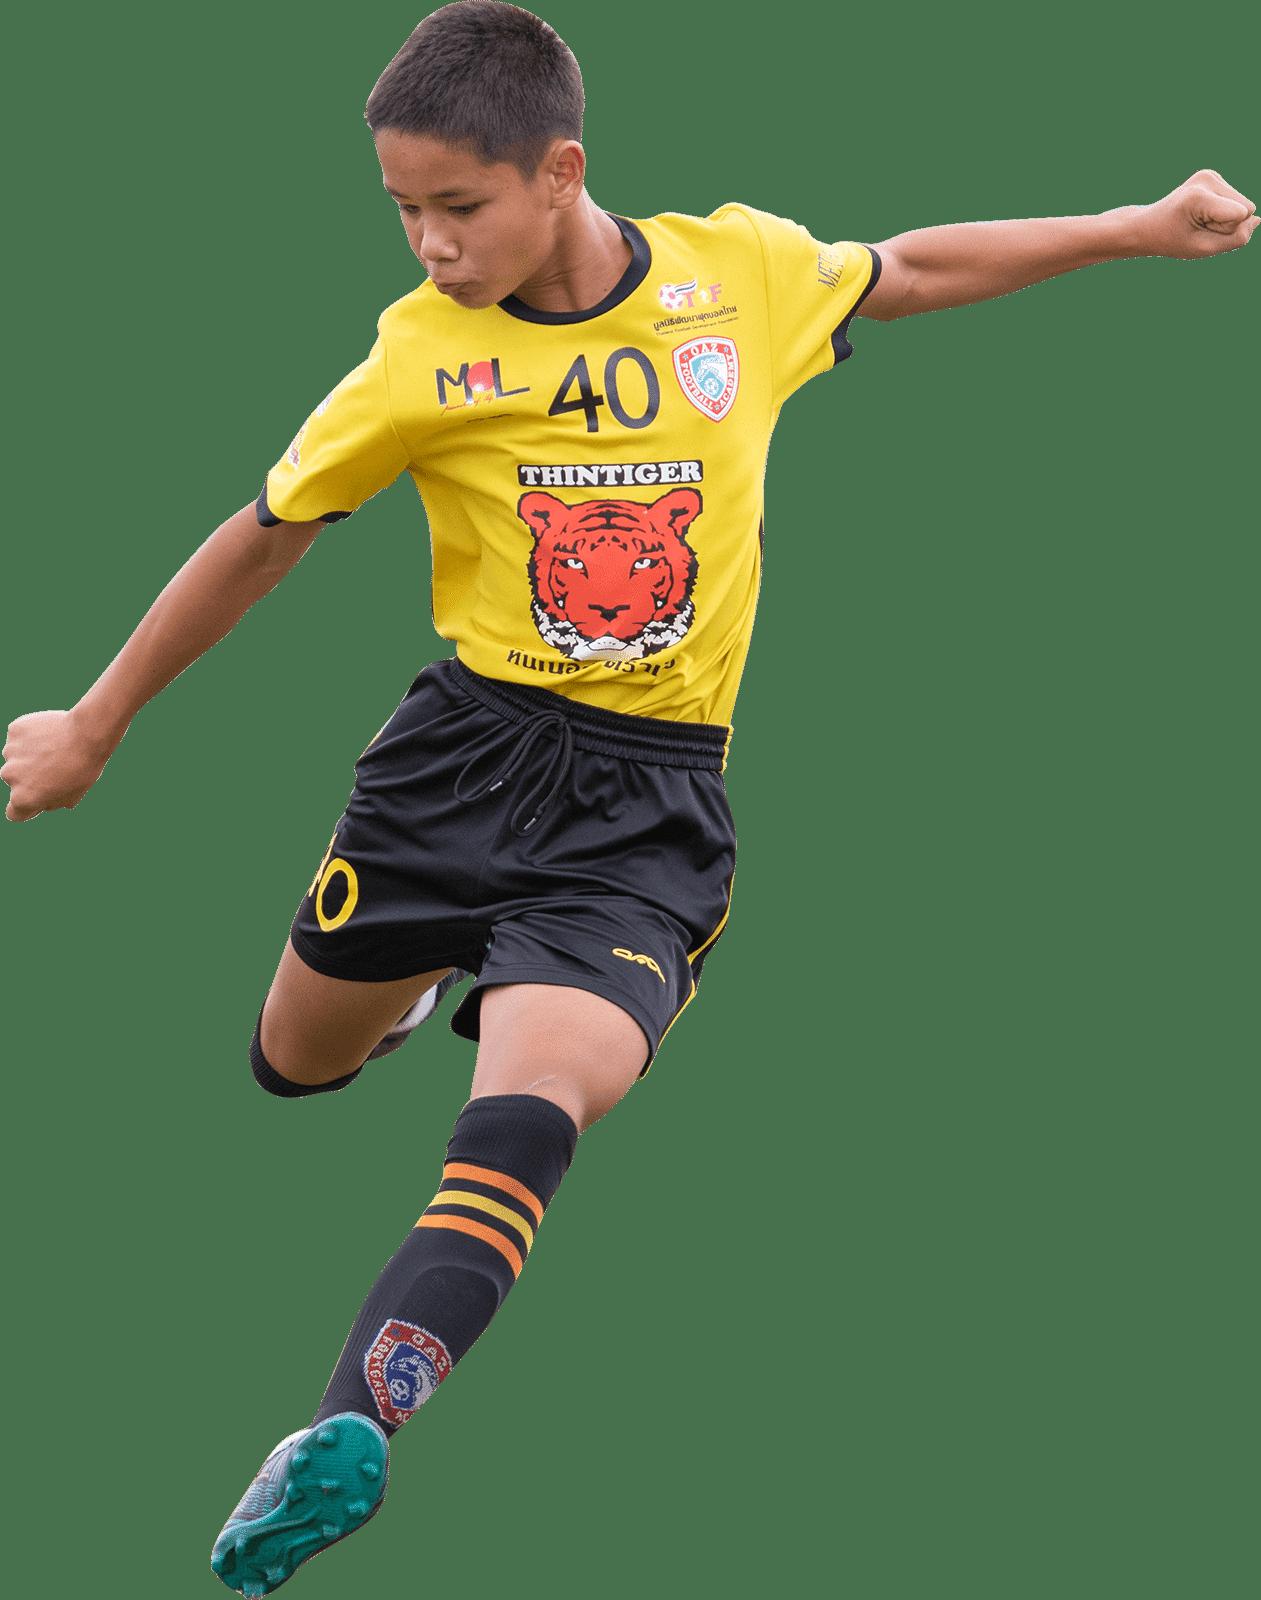 ss-footballer-4